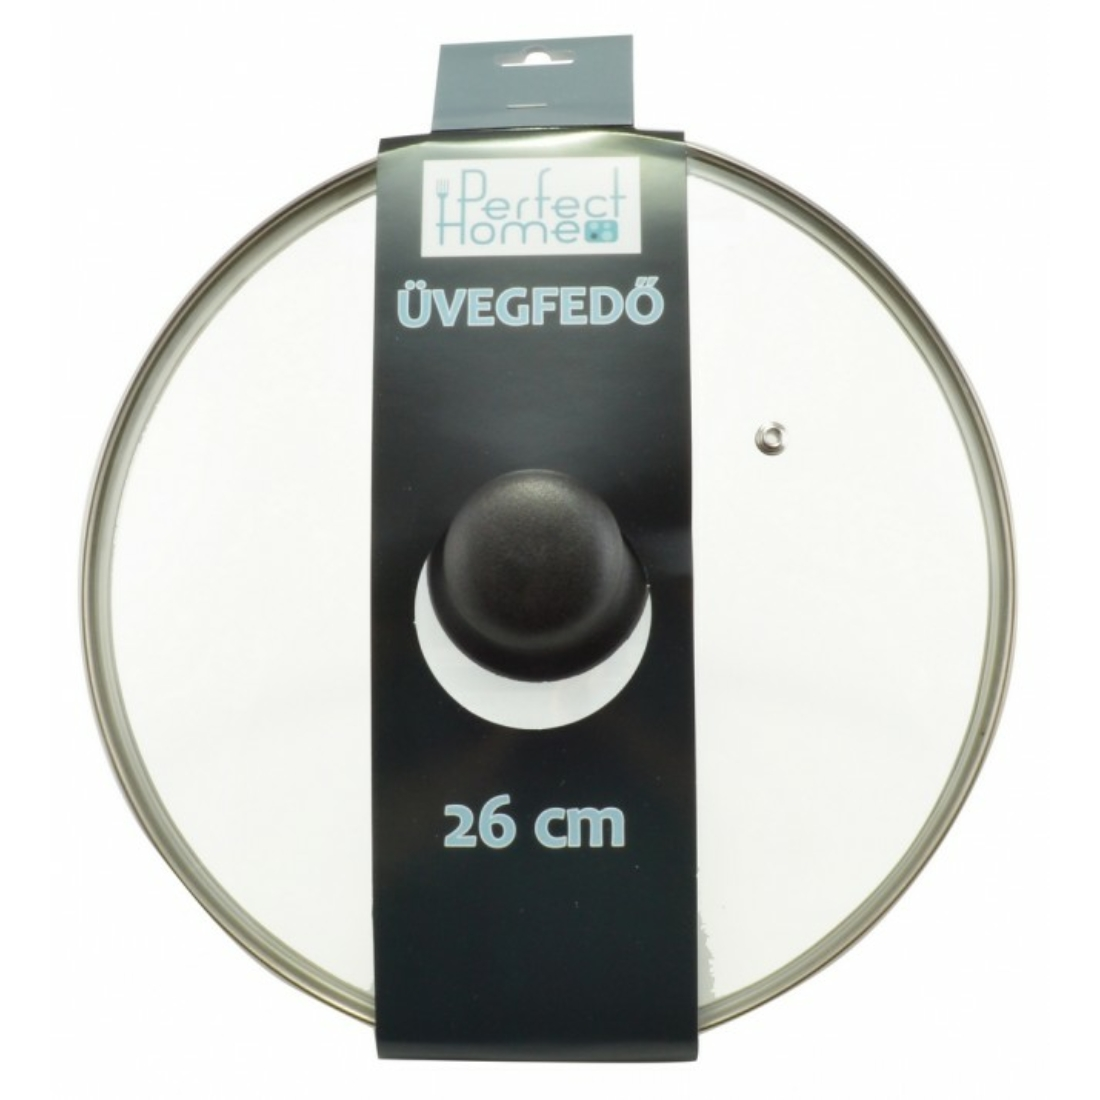 Üvegfedő 26 cm